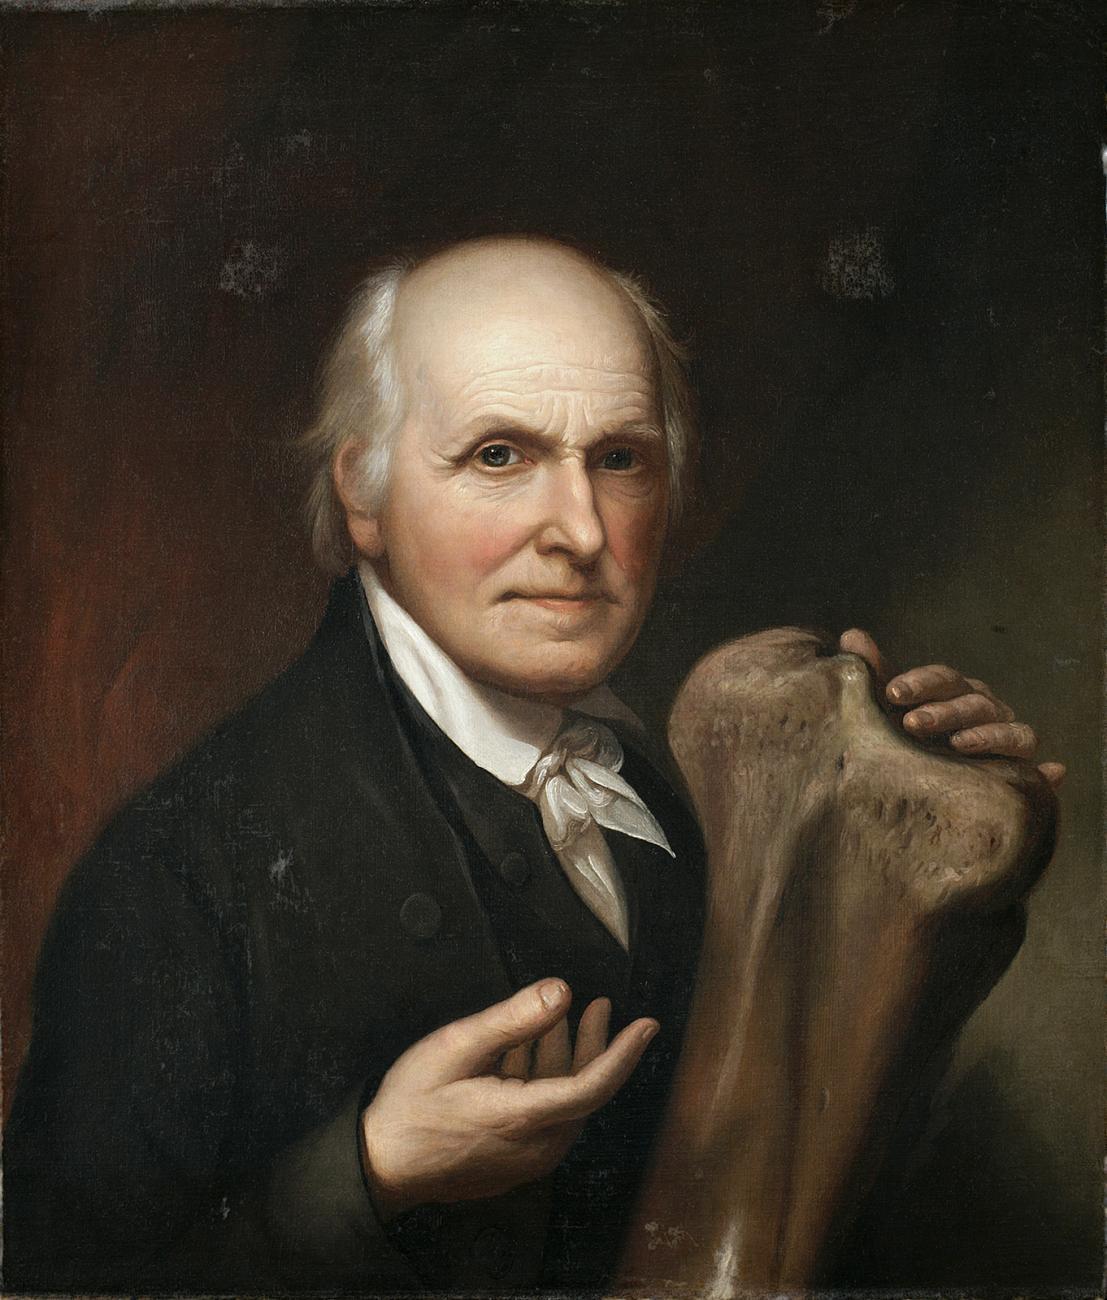 A portrait of a man sitting.